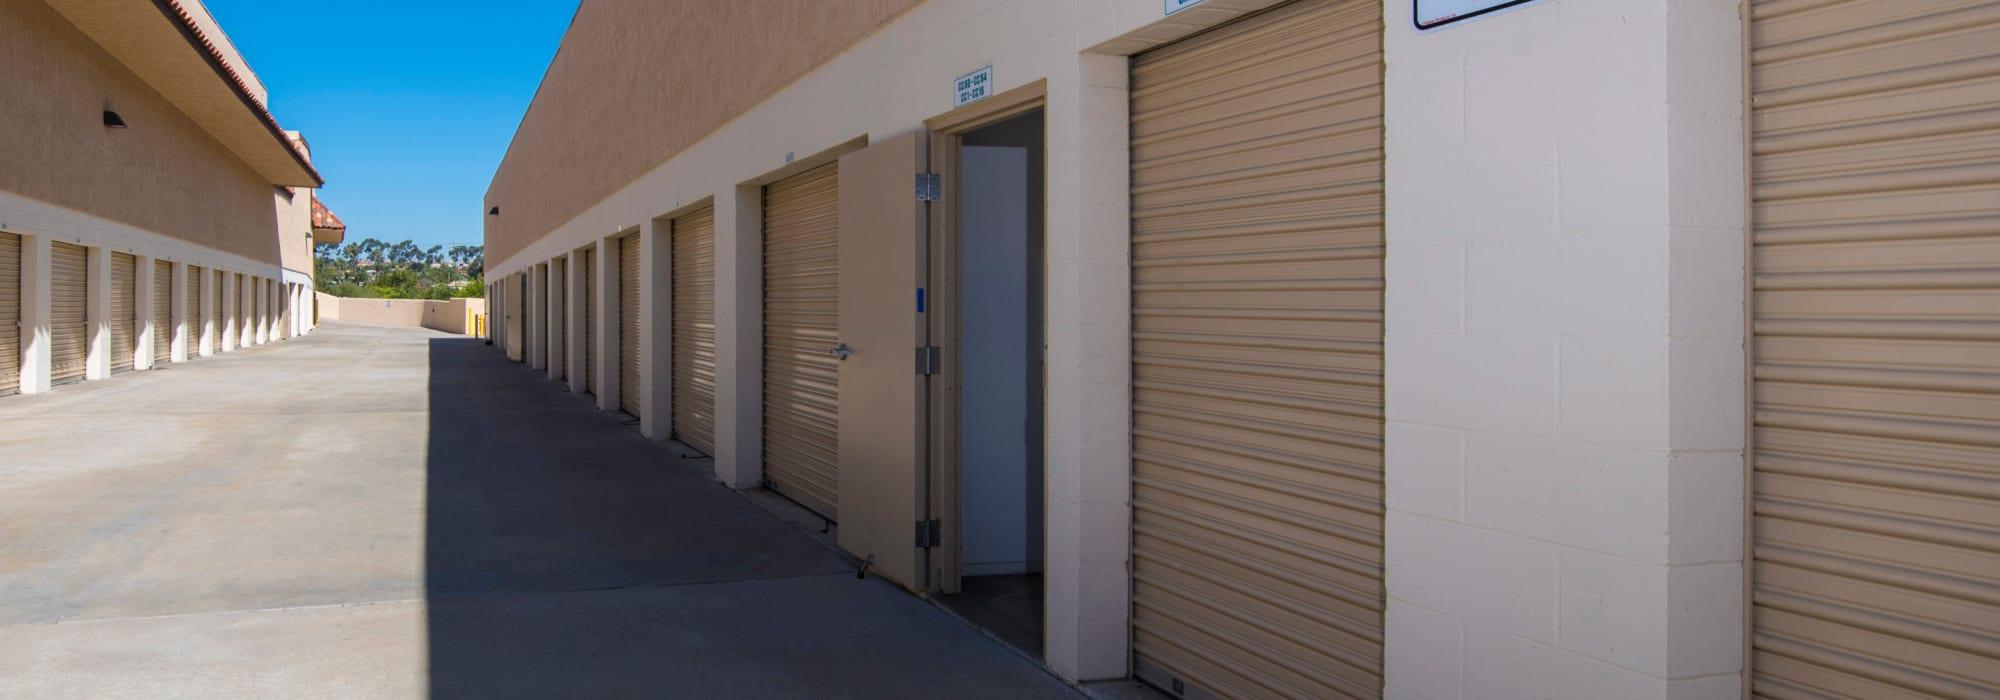 Outdoor units at Carlsbad Self Storage in Carlsbad, California